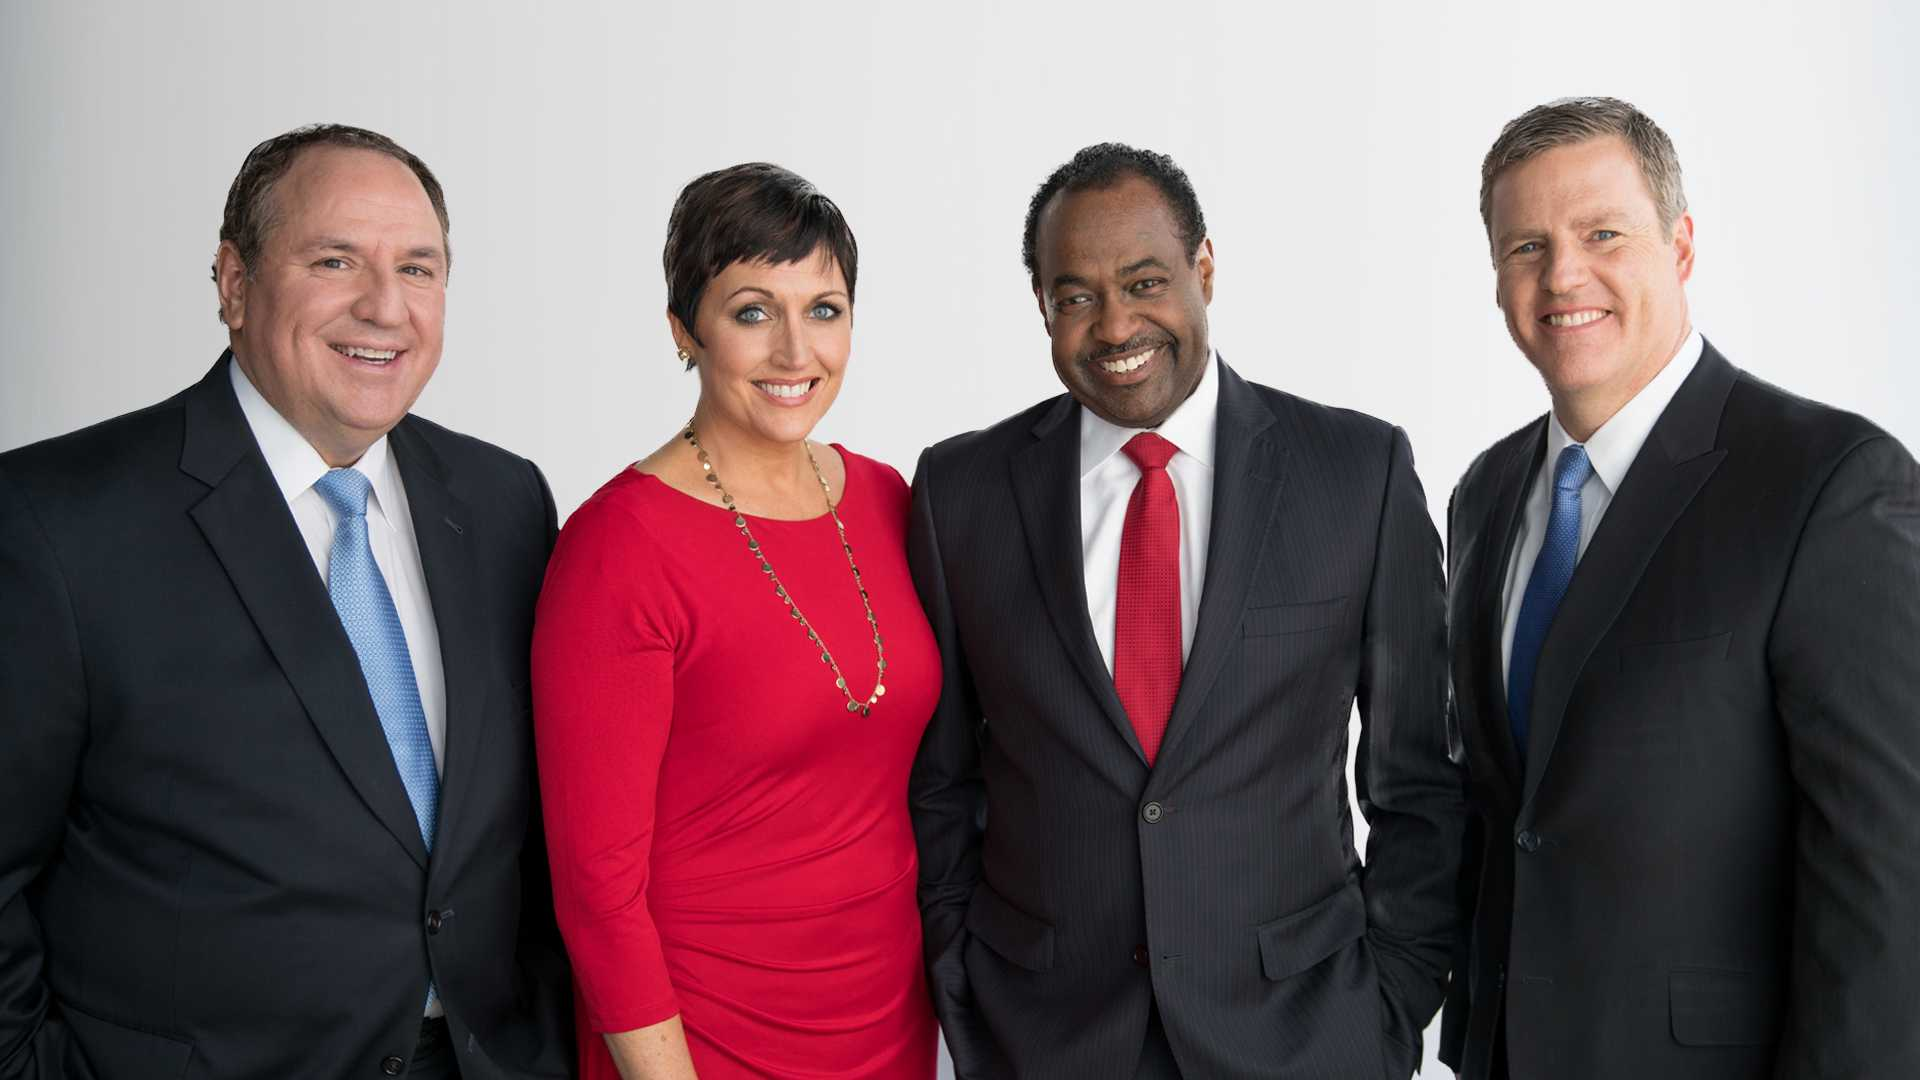 KMBC/KCWE Anchor Appearances